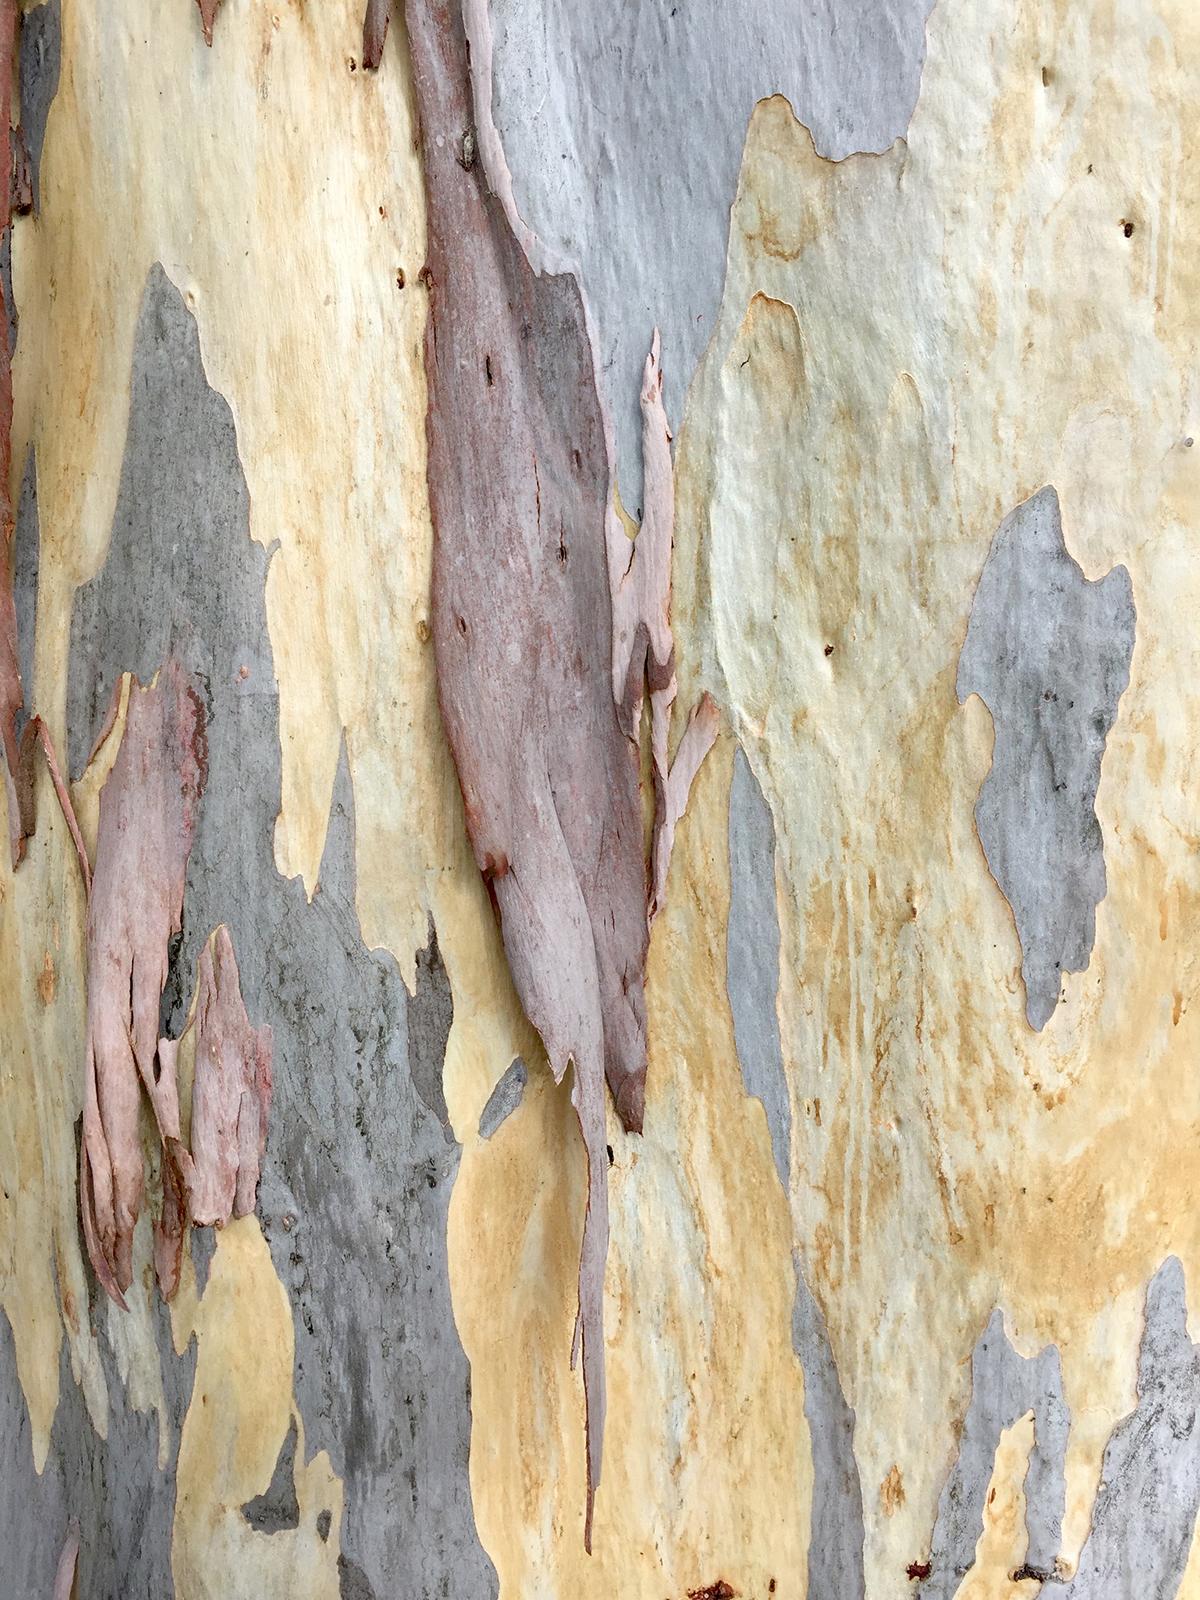 gum-tree-bark.jpg